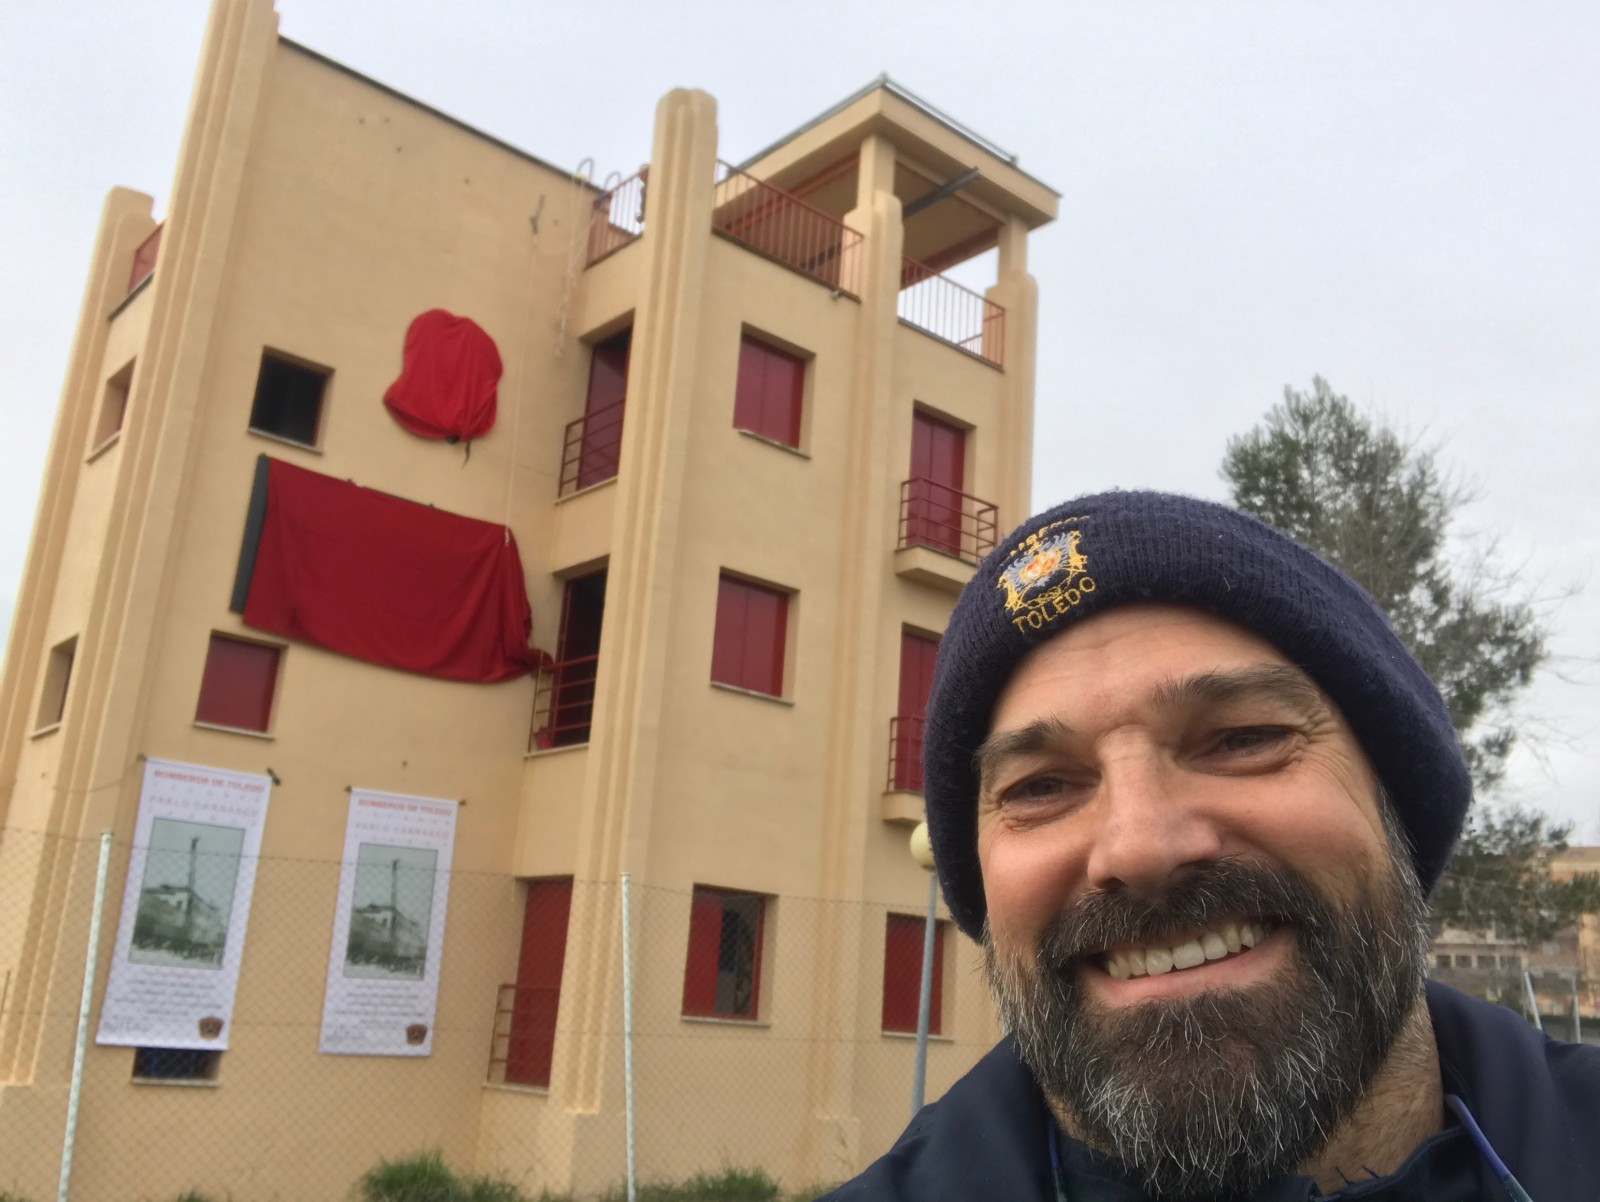 Montaje Carteles Homenaje a Pablo Carrasco. 30 años. Bomberos de Toledo